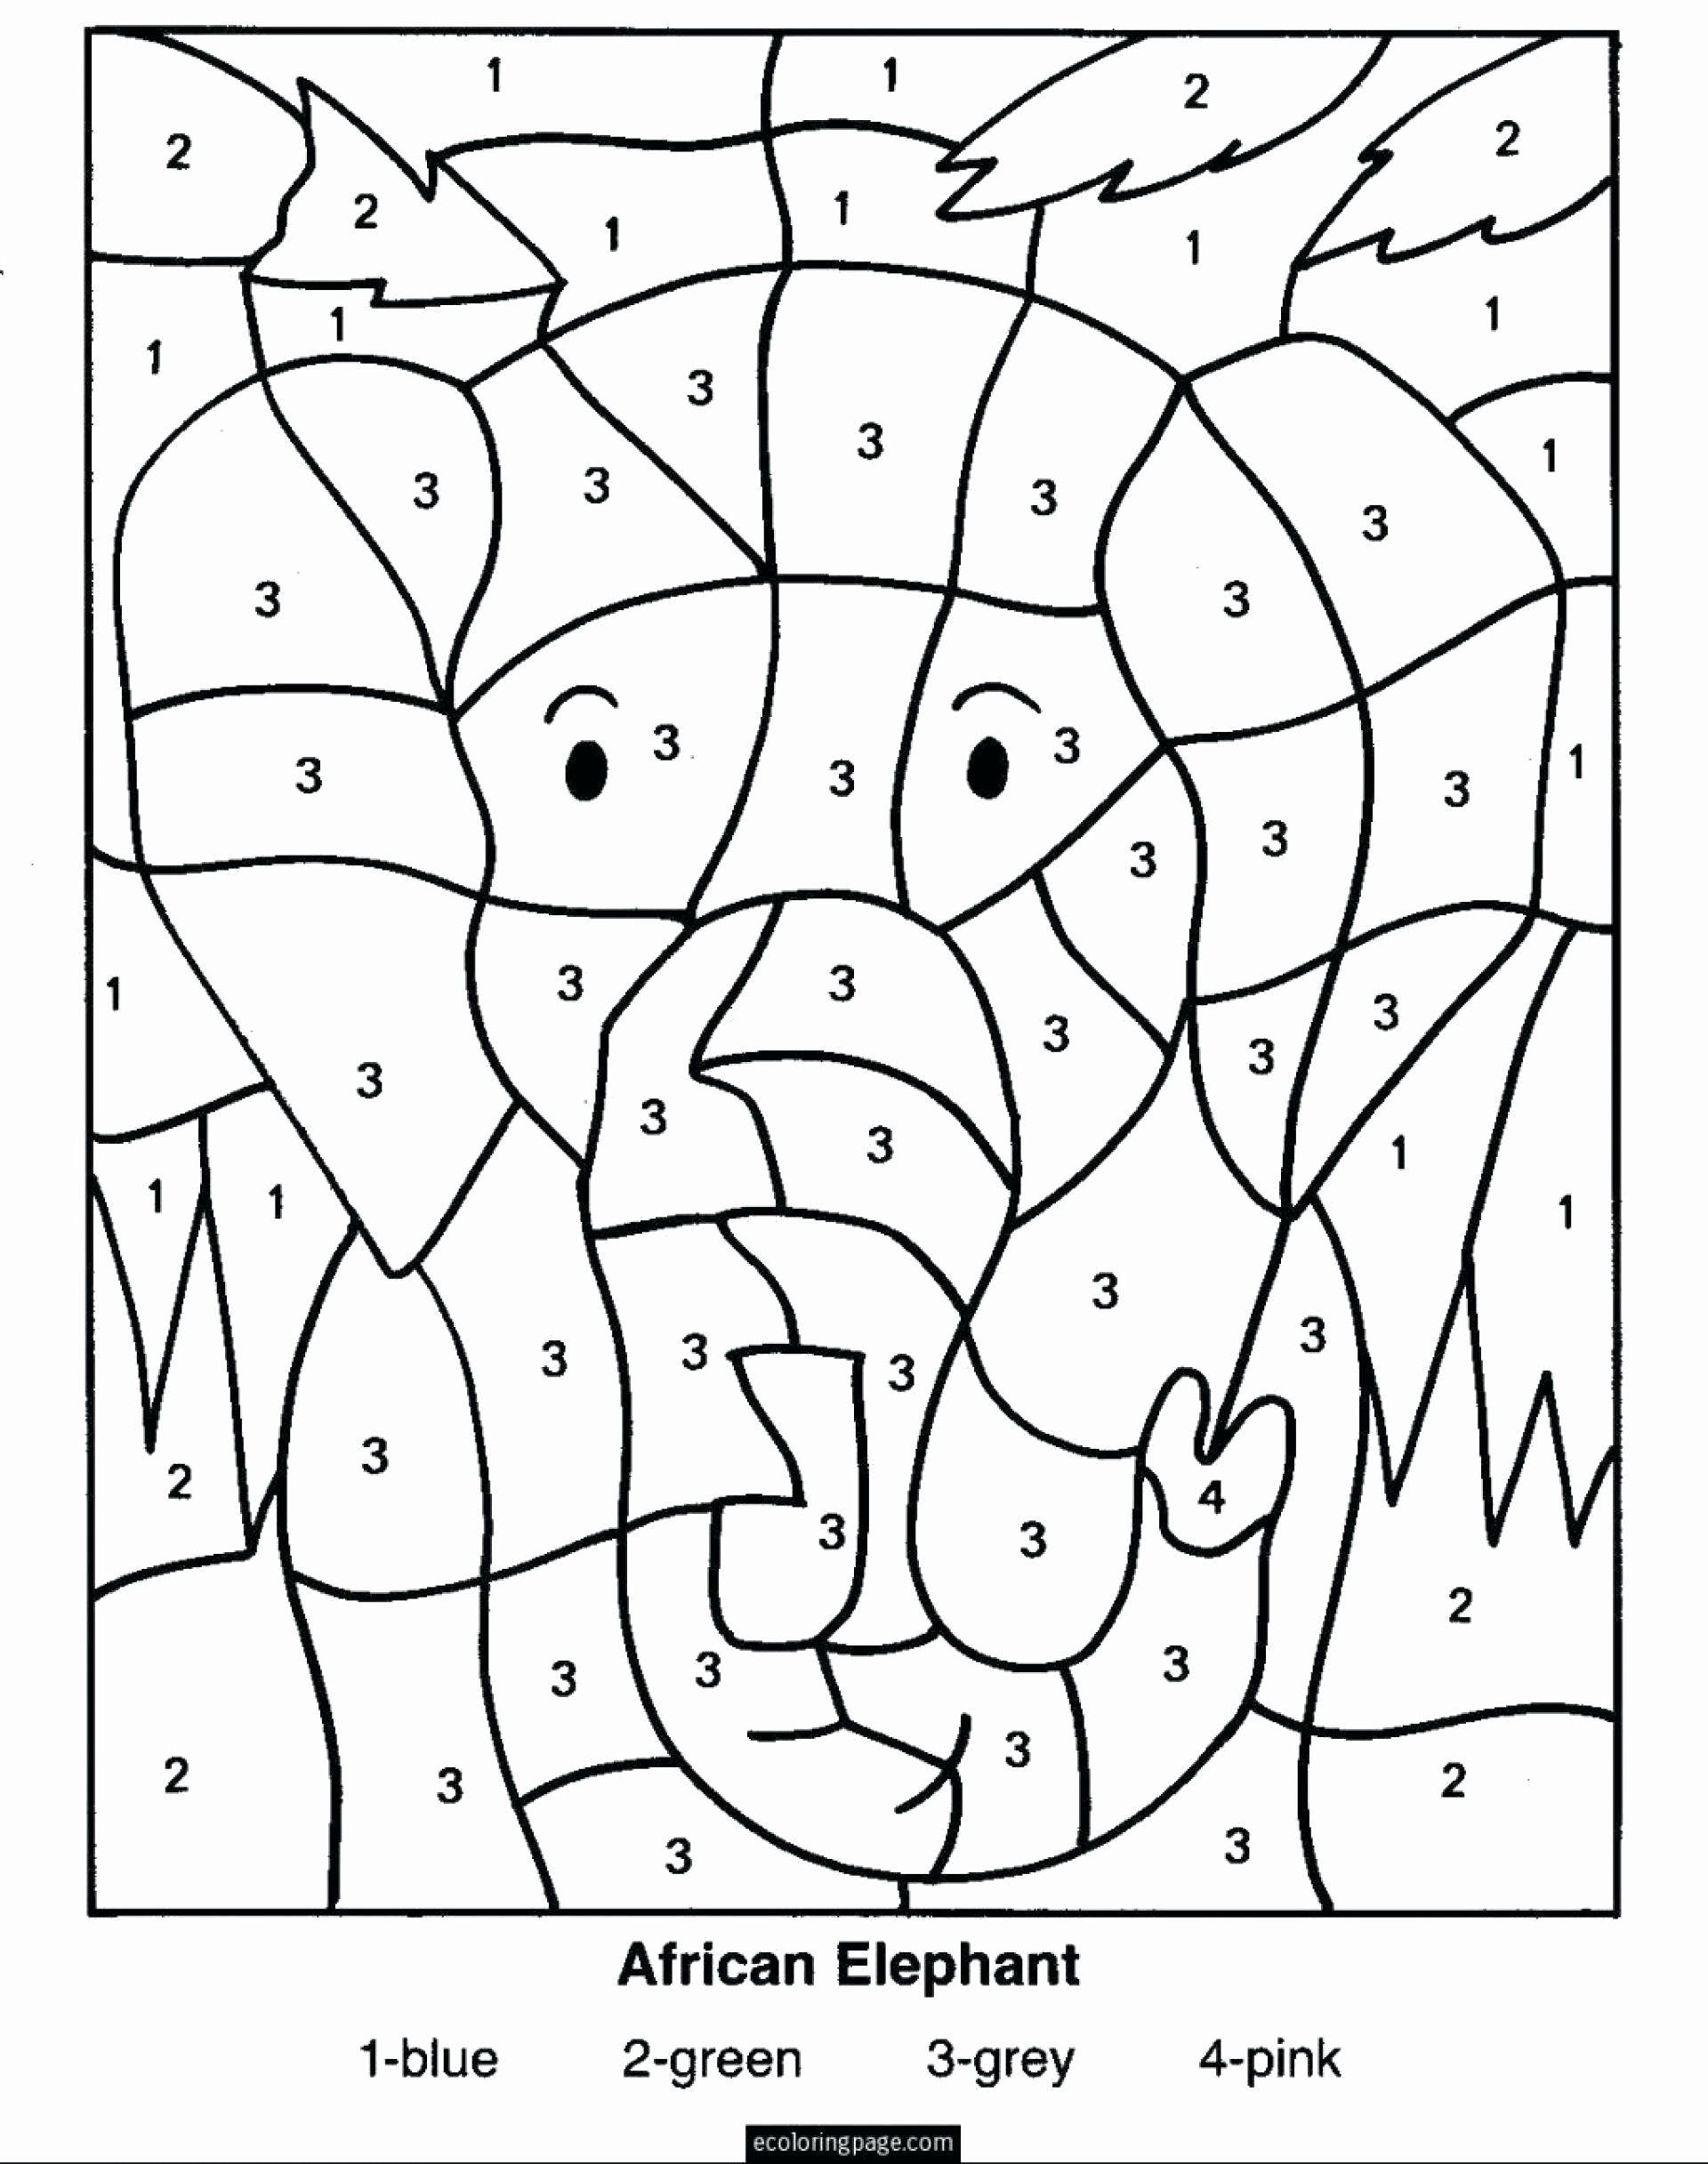 Coloring Activities For 1st Graders Unique Coloring Math Worksheets 1st Grade Lassosheet In 2020 Math Coloring Color Worksheets Christmas Math Worksheets [ 2433 x 1920 Pixel ]